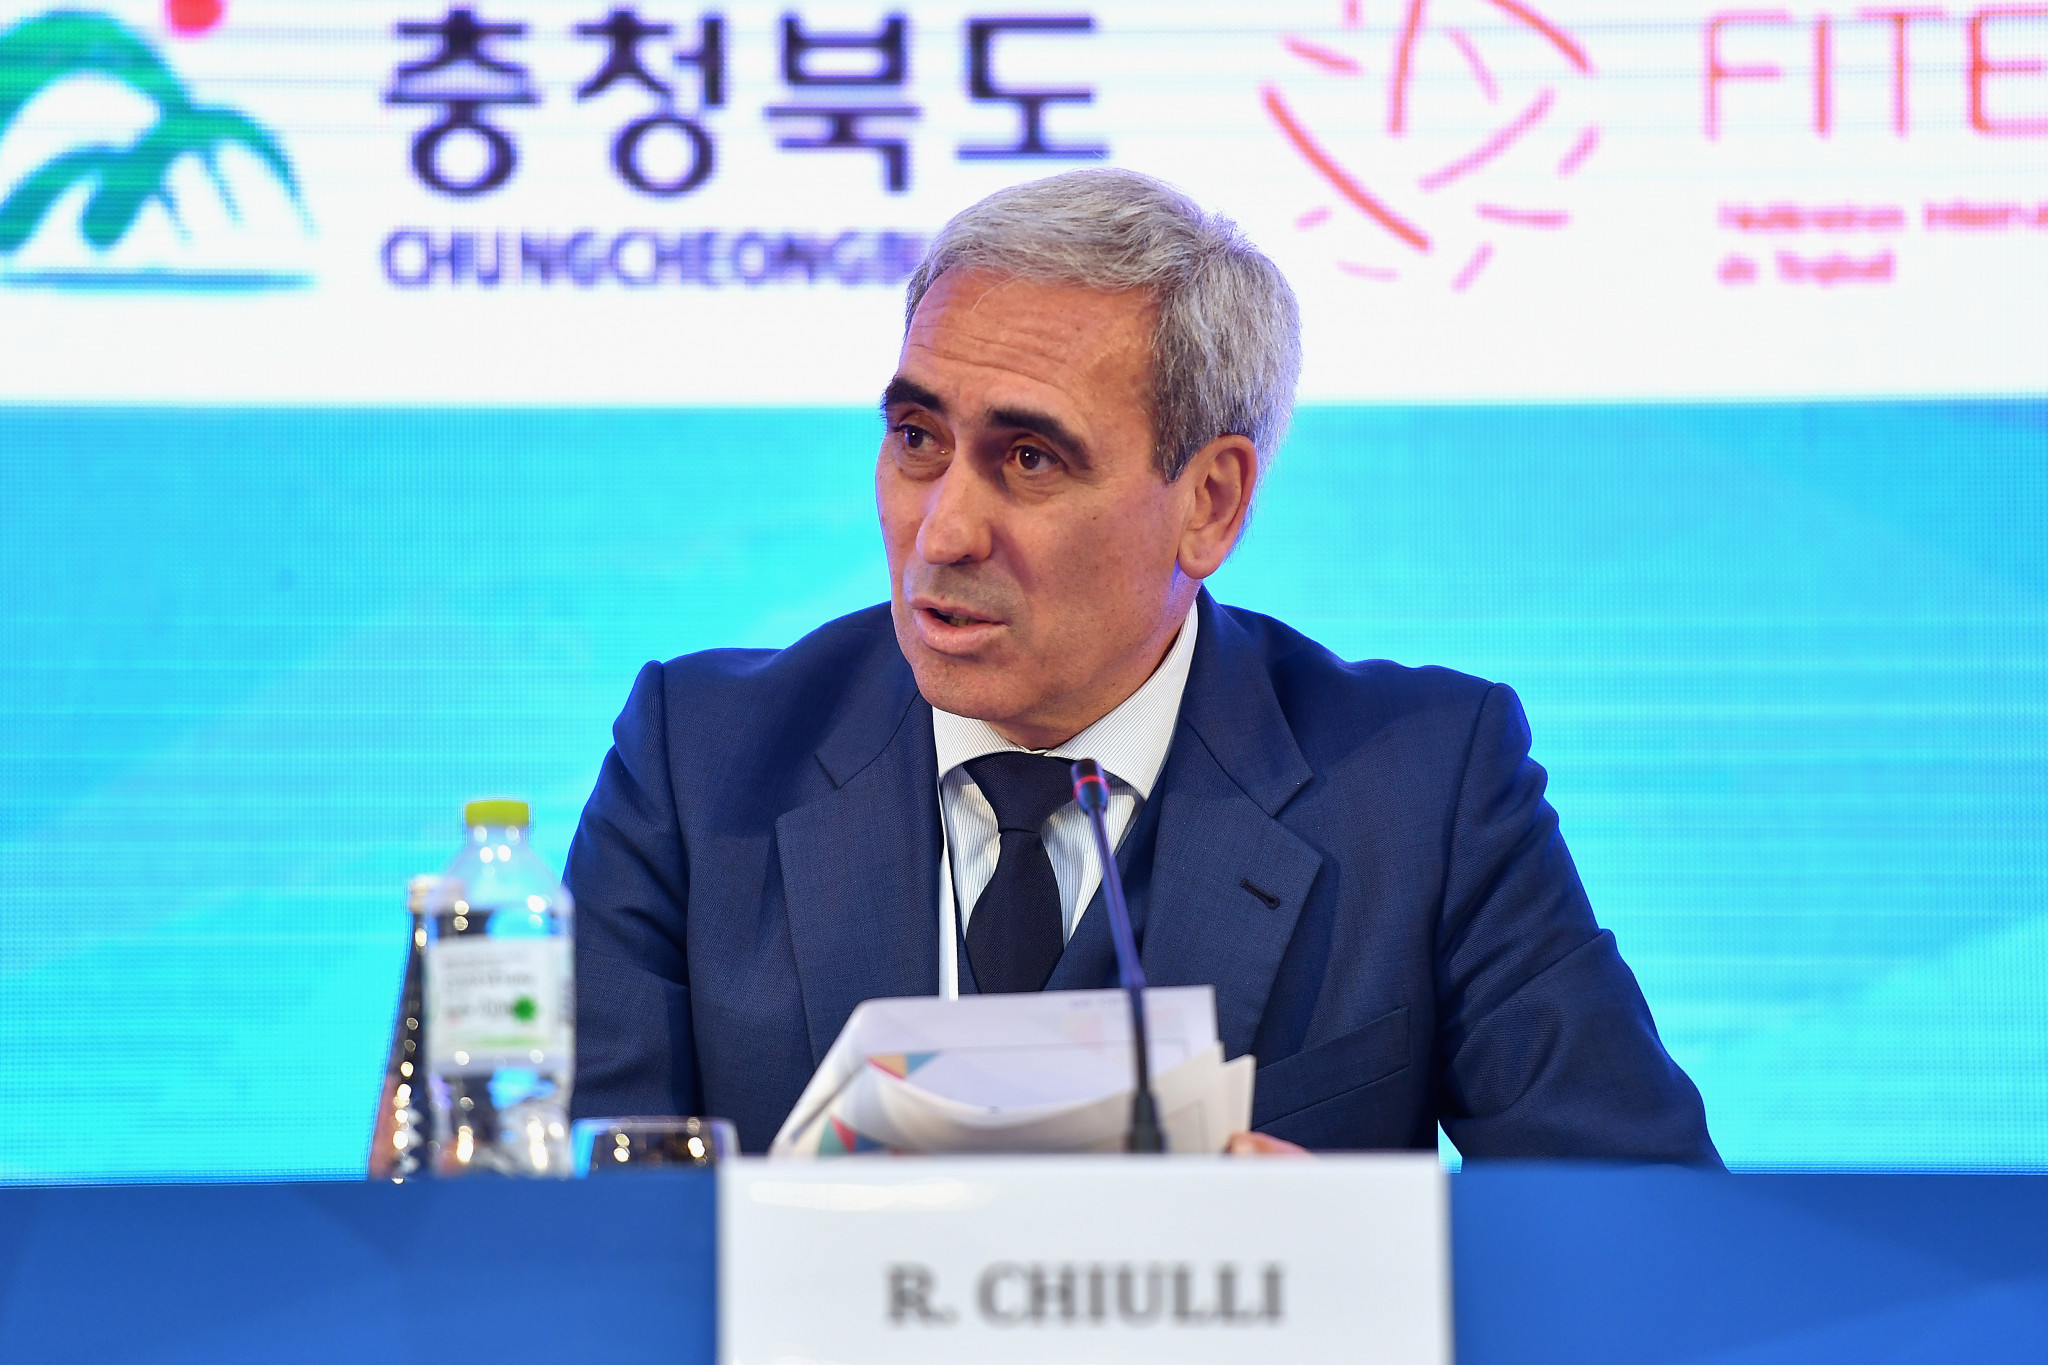 GAISF President Chiulli praises Tokyo 2020 as part of UN International Day of Friendship